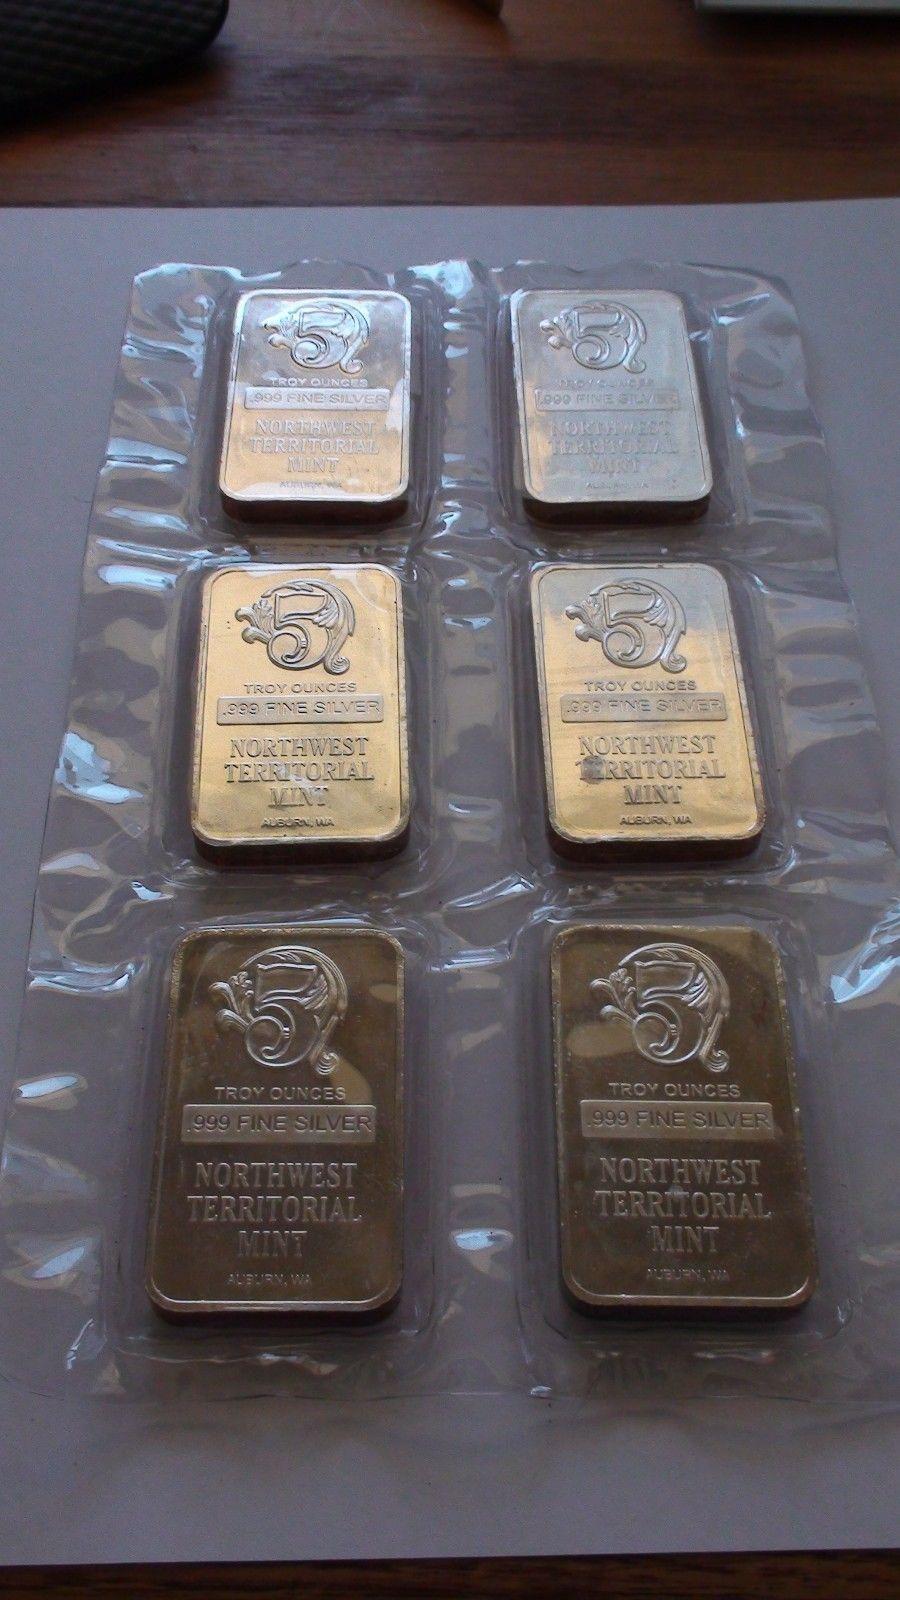 6x 5 Oz Silver Bar 999 Fine Ali Baba Selani Gold And Diamond Splyer Dubai Contact Please Call Me Order To Get A Chan Silver Investing Silver Bars Gold Bullion